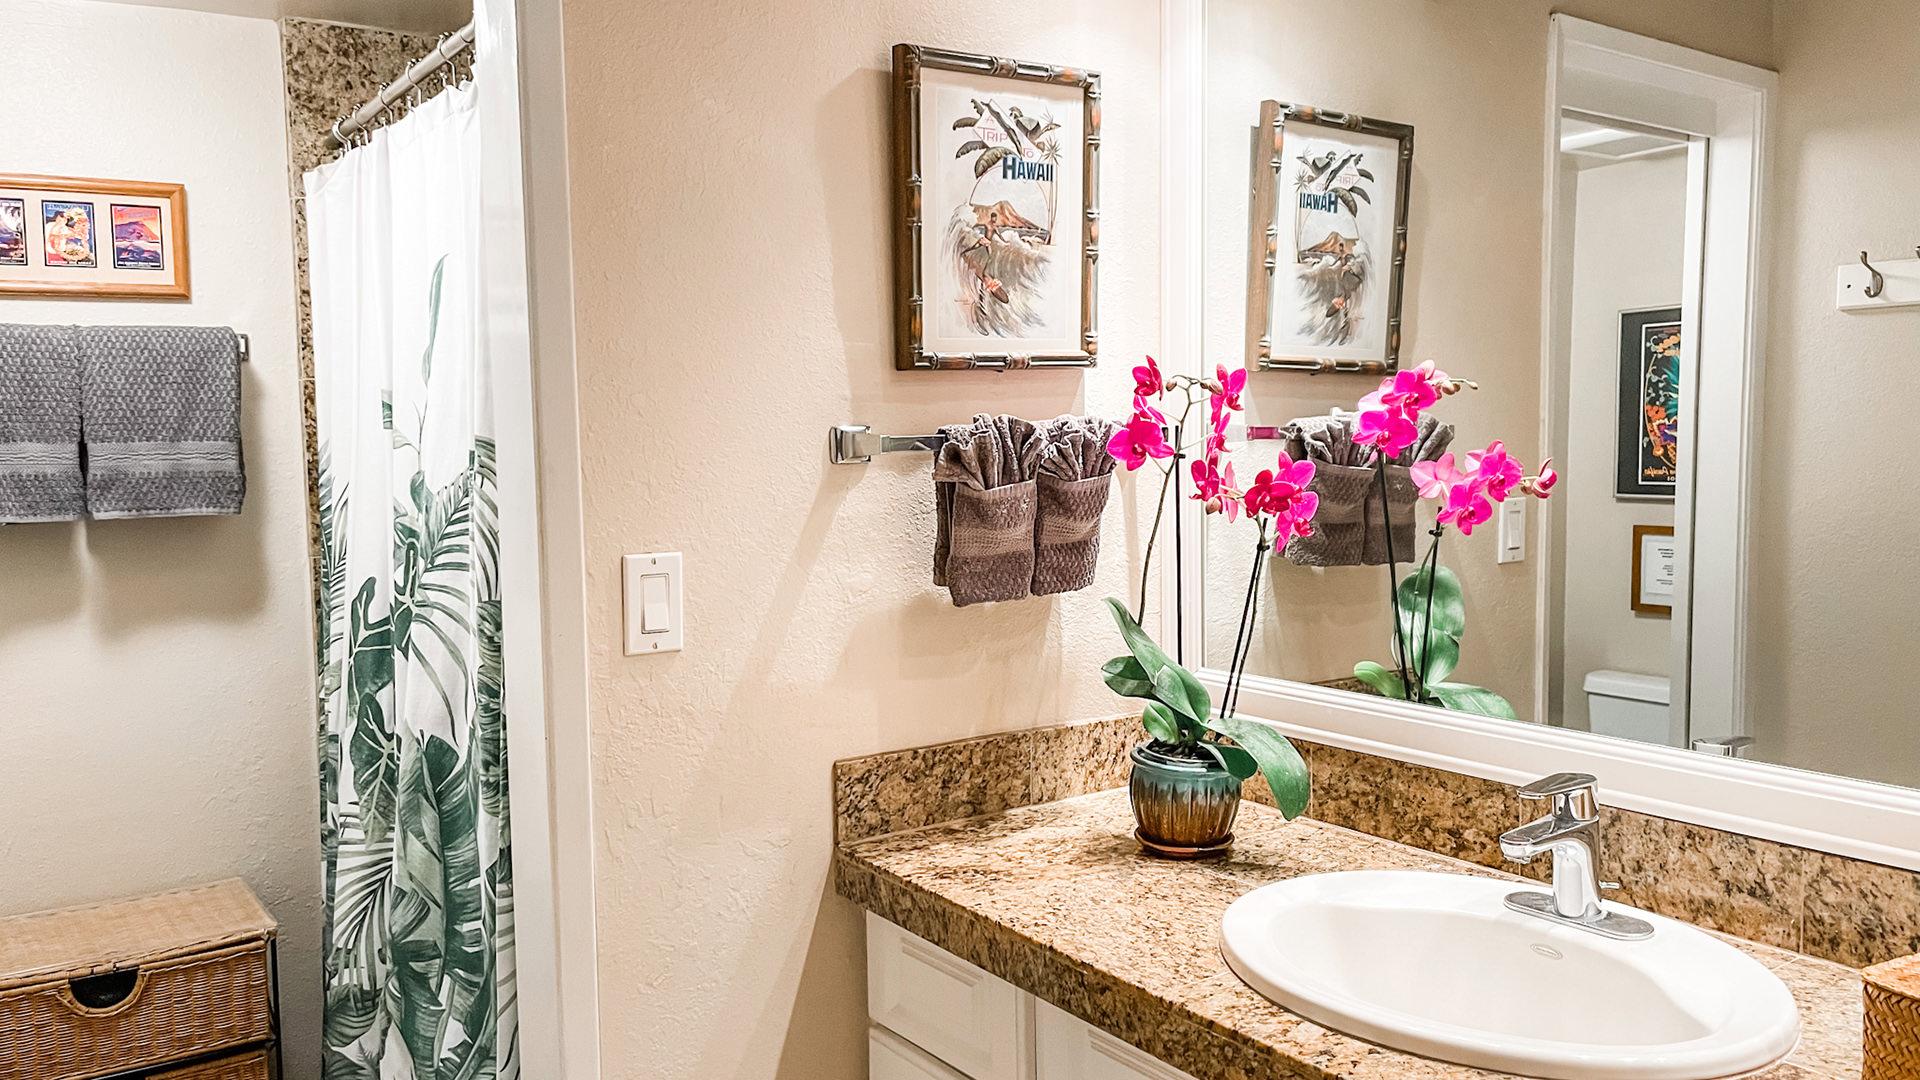 B211 Bathroom, Shower and Vanity